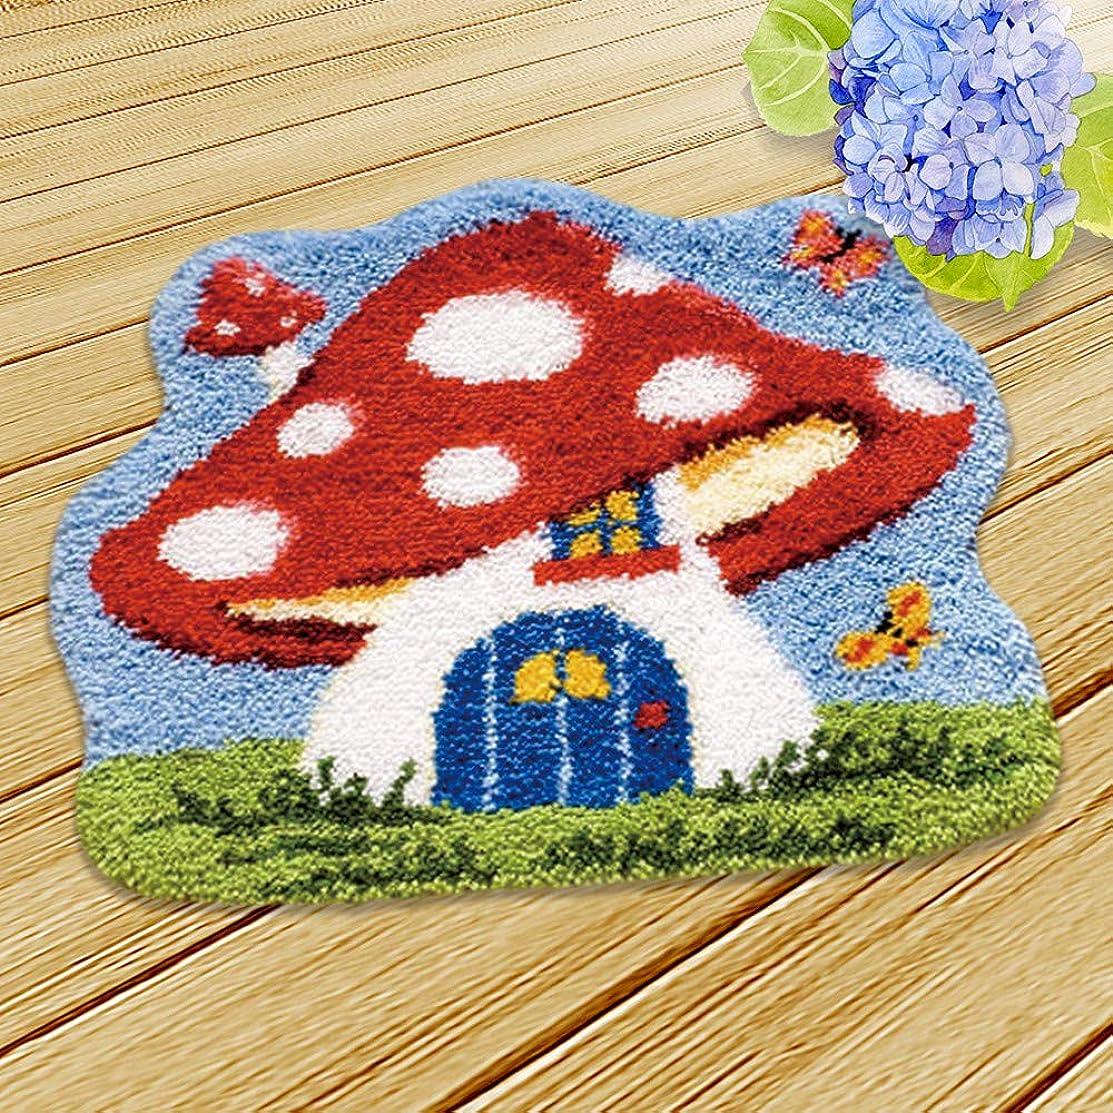 Ylkgogo DIY Crochet Yarn Kits,Needlework Latch Hook Kit Unfinished Crocheting Rug Yarn Cushion Embroidery Carpet Set (Mushroom,19.5